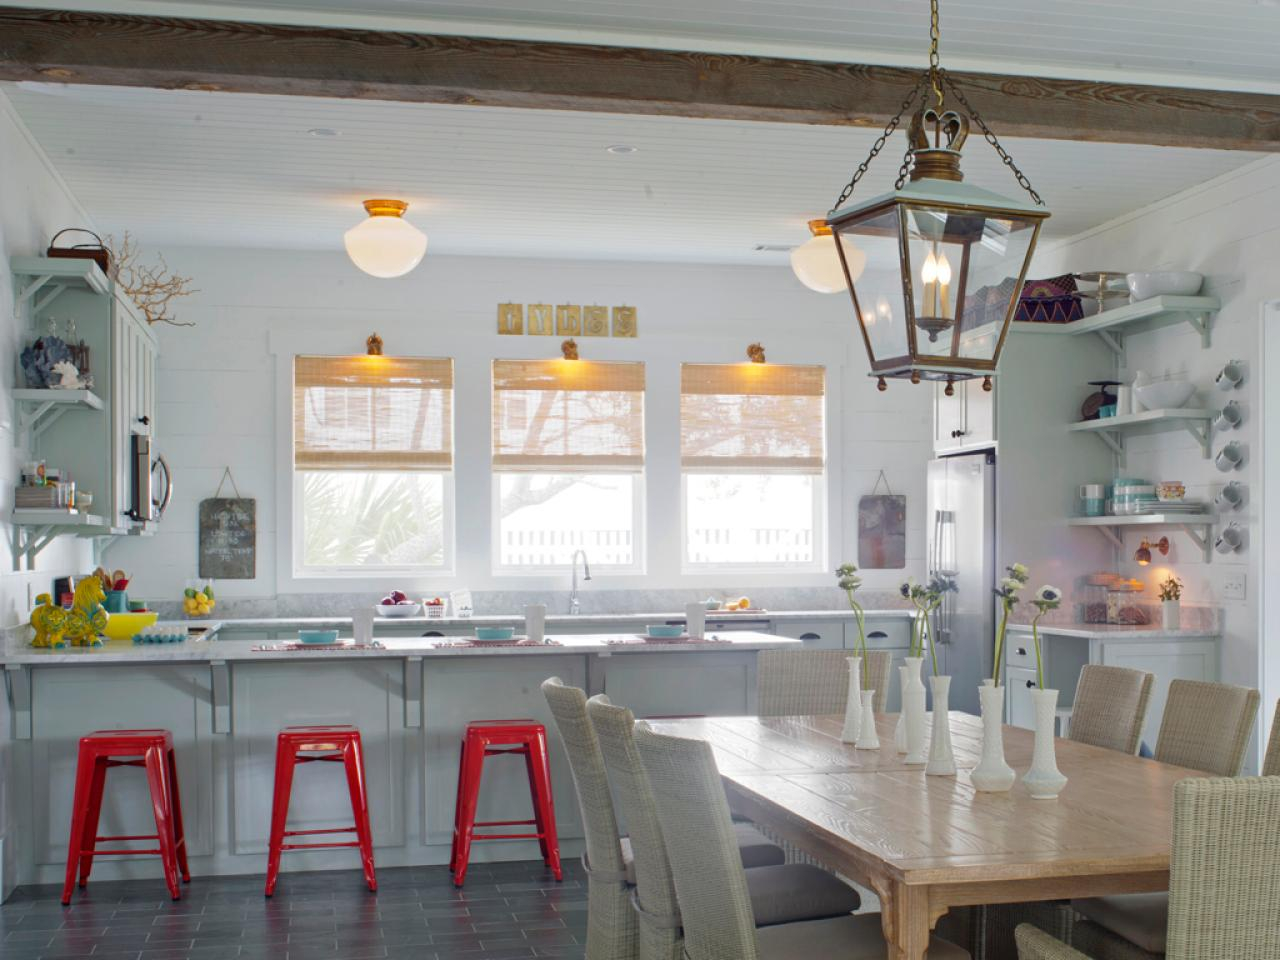 Cottage kitchen lighting - Cottage Kitchen Lighting 20